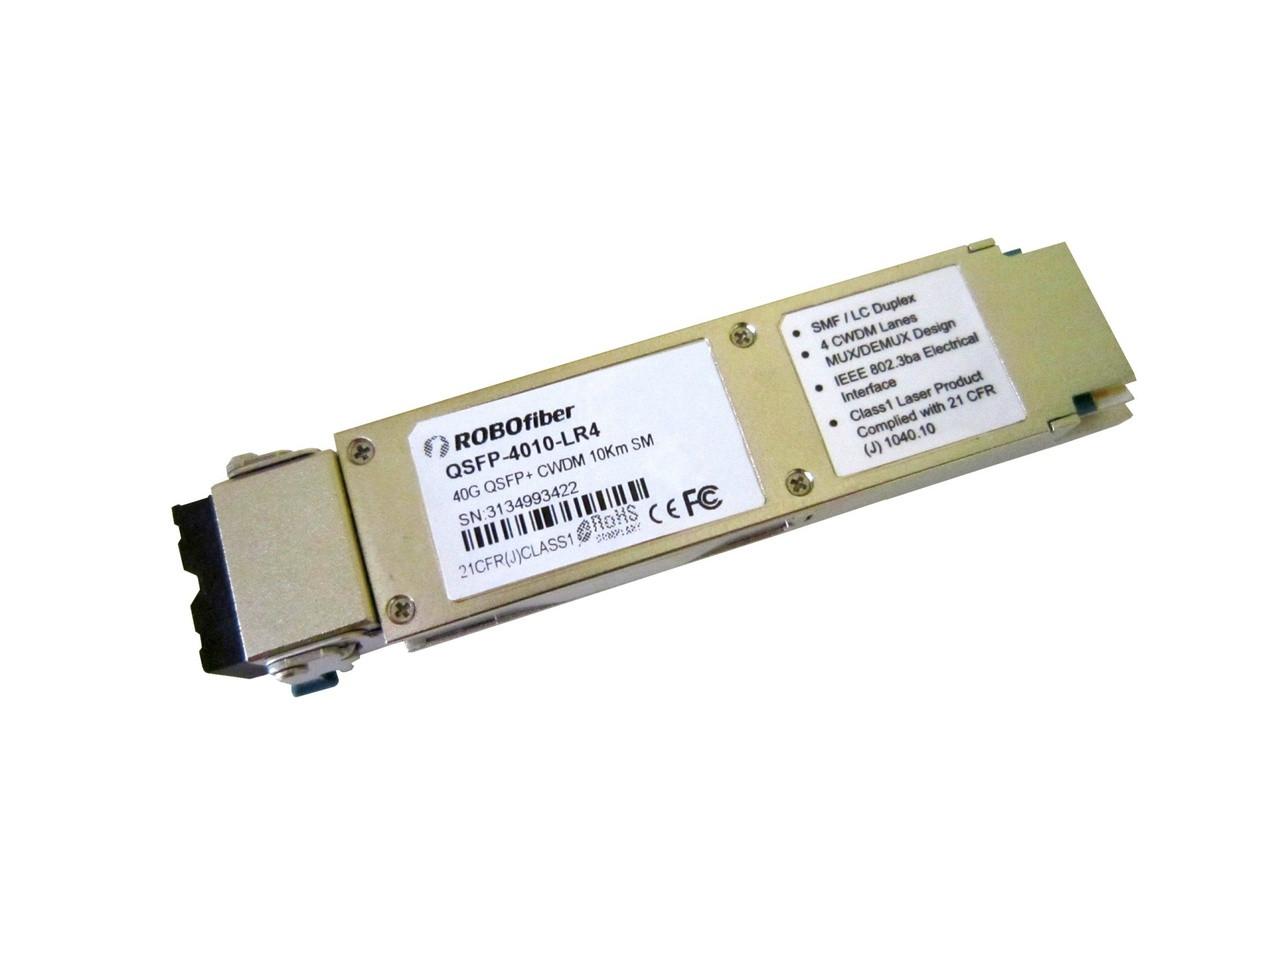 LR4 10Km single-mode 40G rate QSFP+ LC connector CWDM